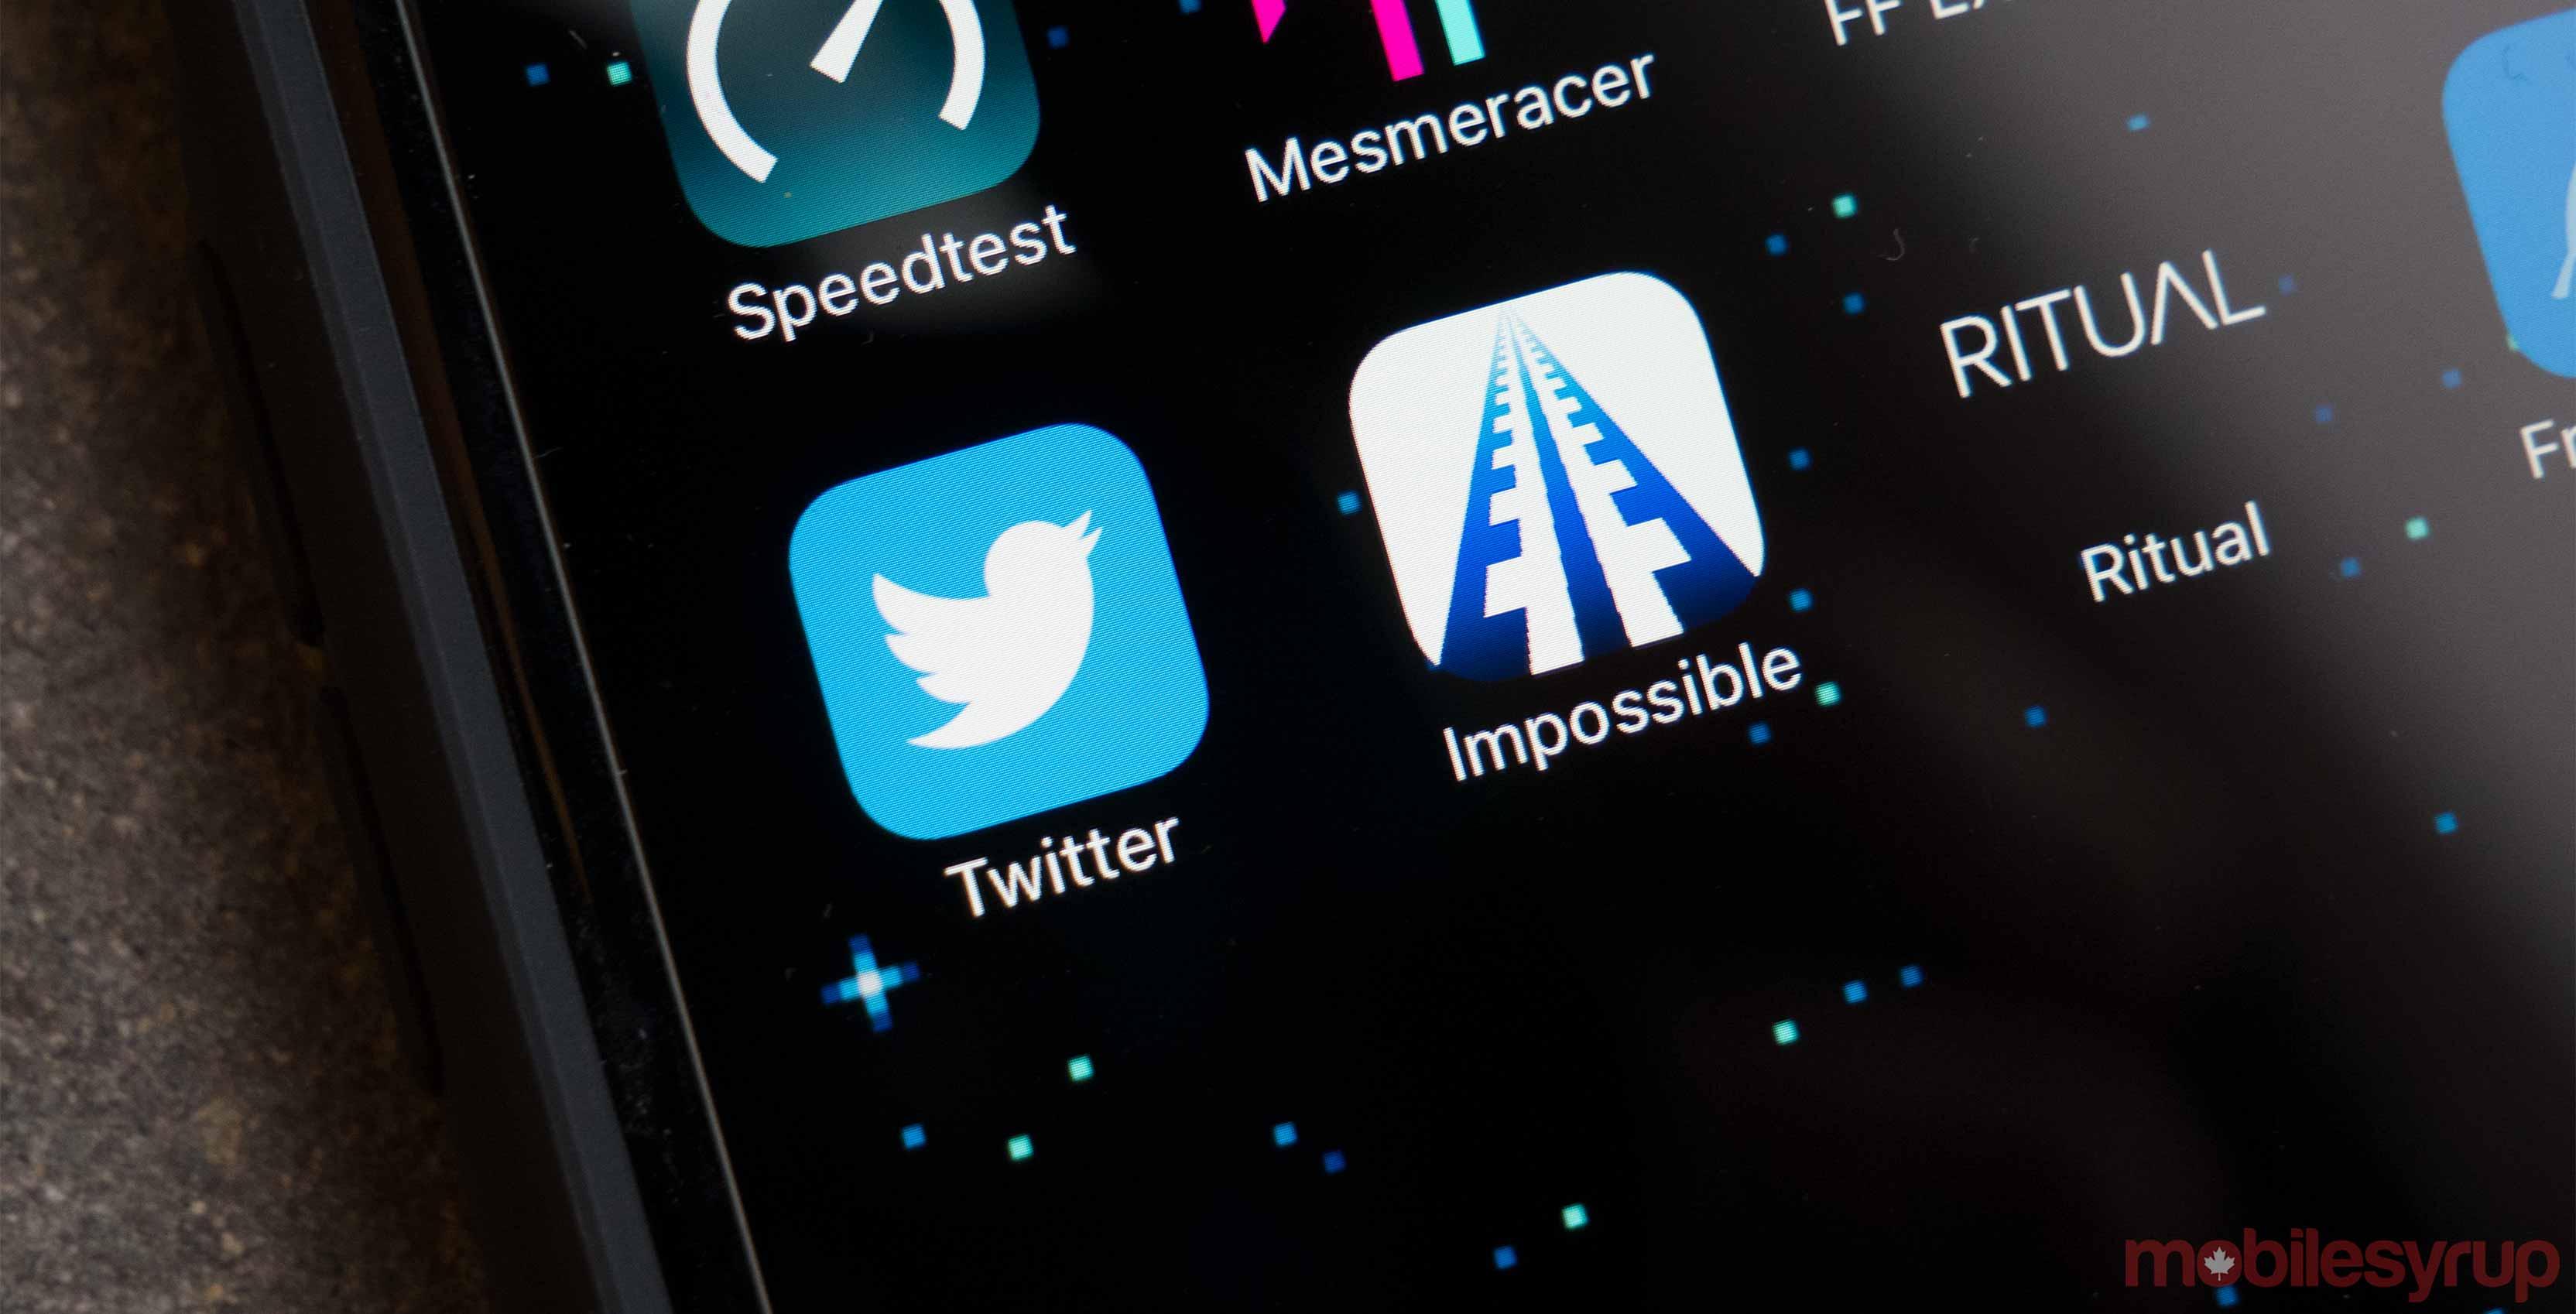 Twitter IOS App - twitter q4 2016 earnings